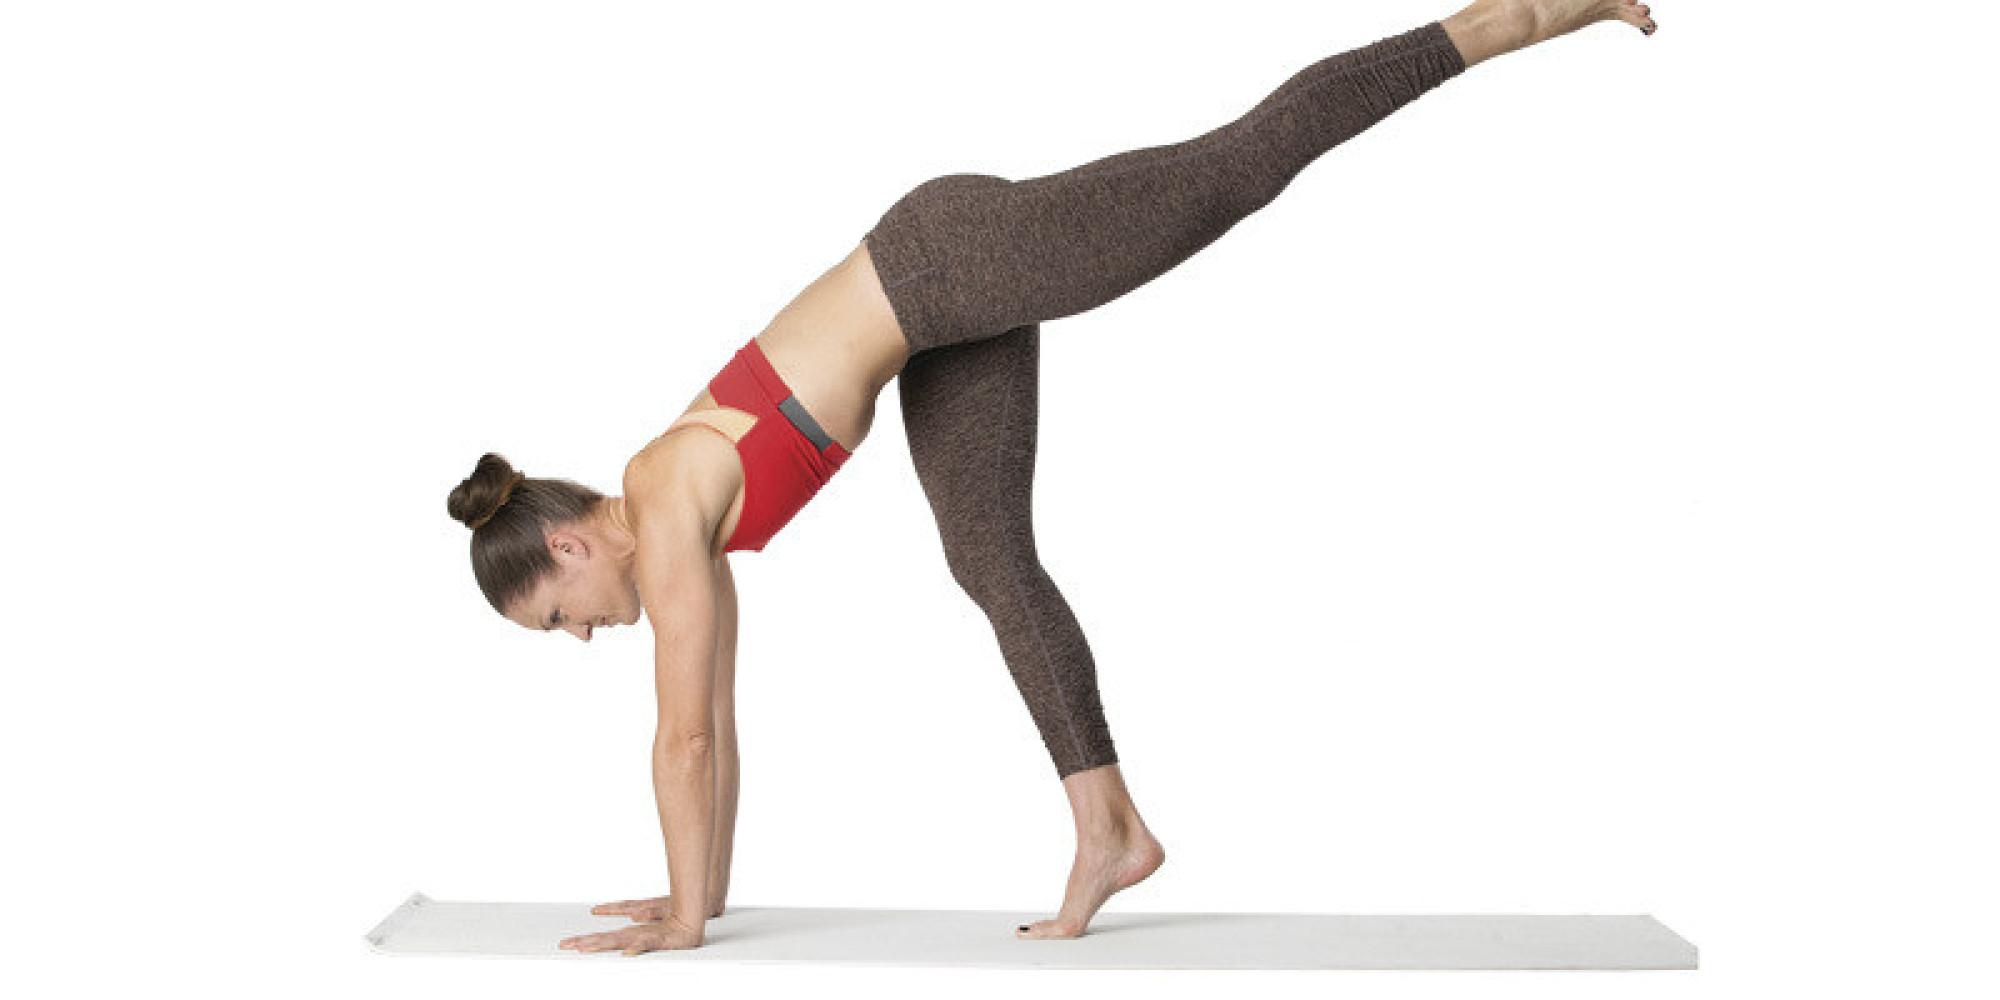 Yoga Challenge Pose Handstand